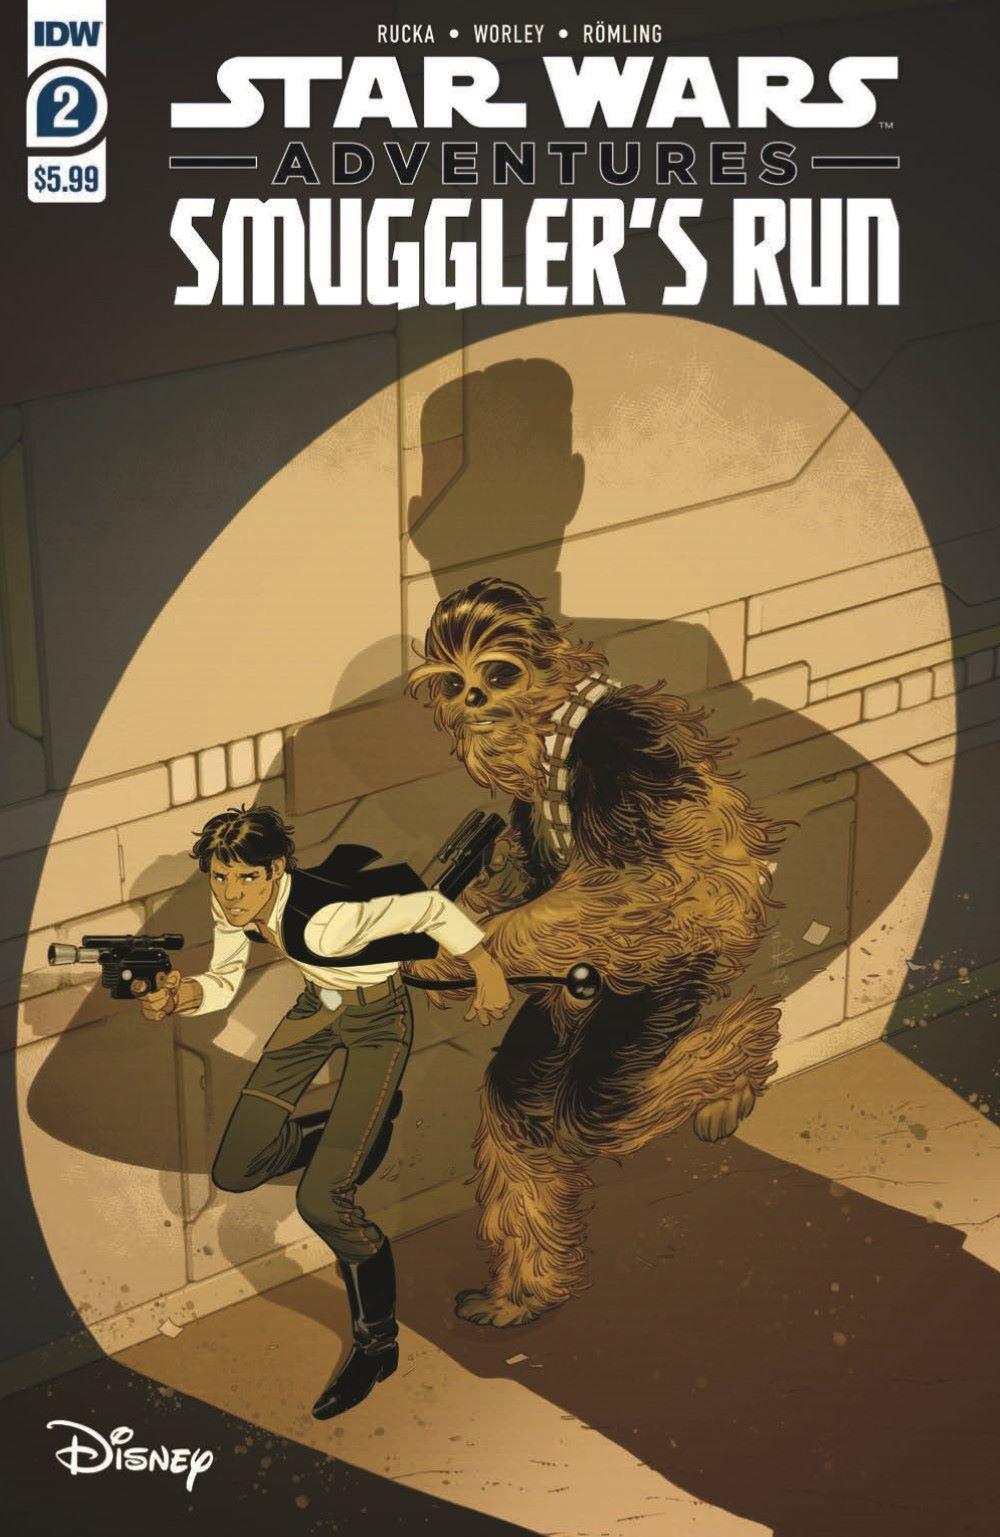 SWA_Smuggler02_pr-1 ComicList Previews: STAR WARS ADVENTURES SMUGGLER'S RUN #2 (OF 2)